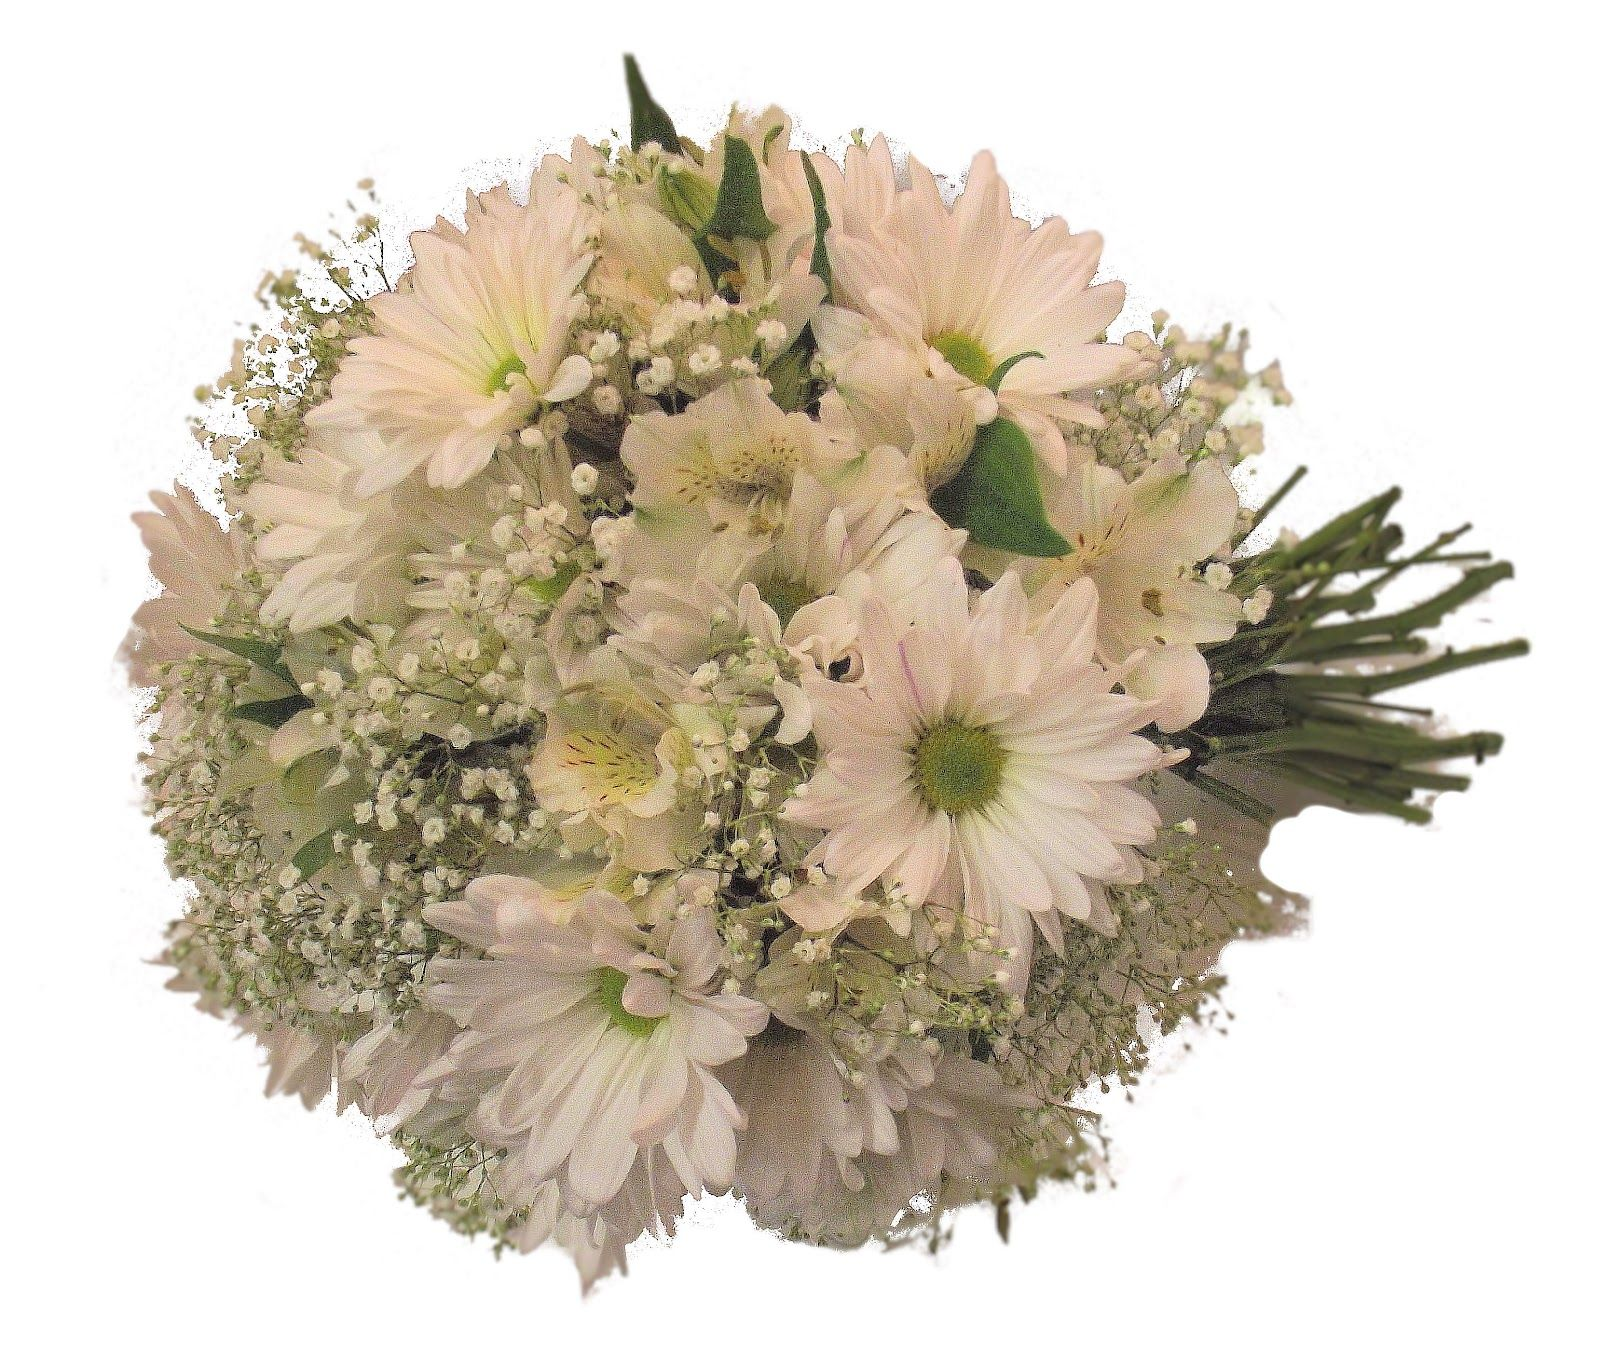 country garden florist. country garden florist: bouquets by florist